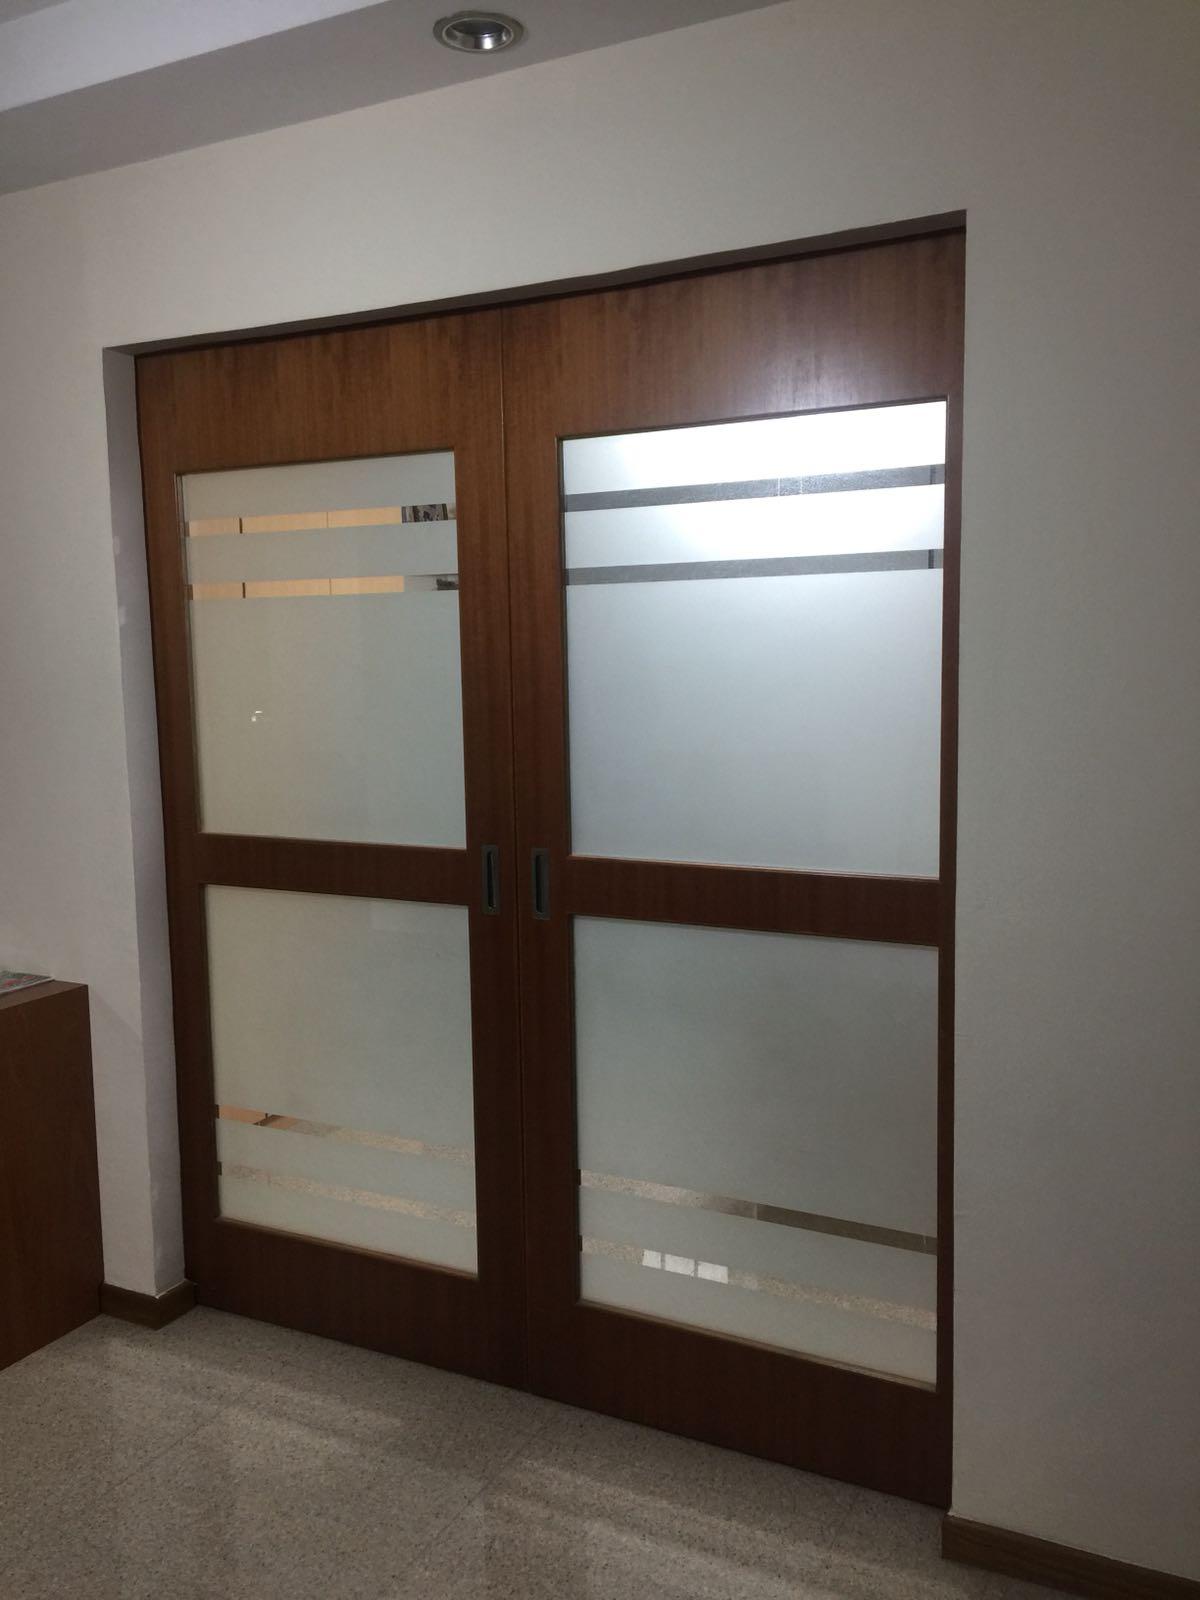 Wooden Door Frame Repair Singapore User Guide Manual That Easy To